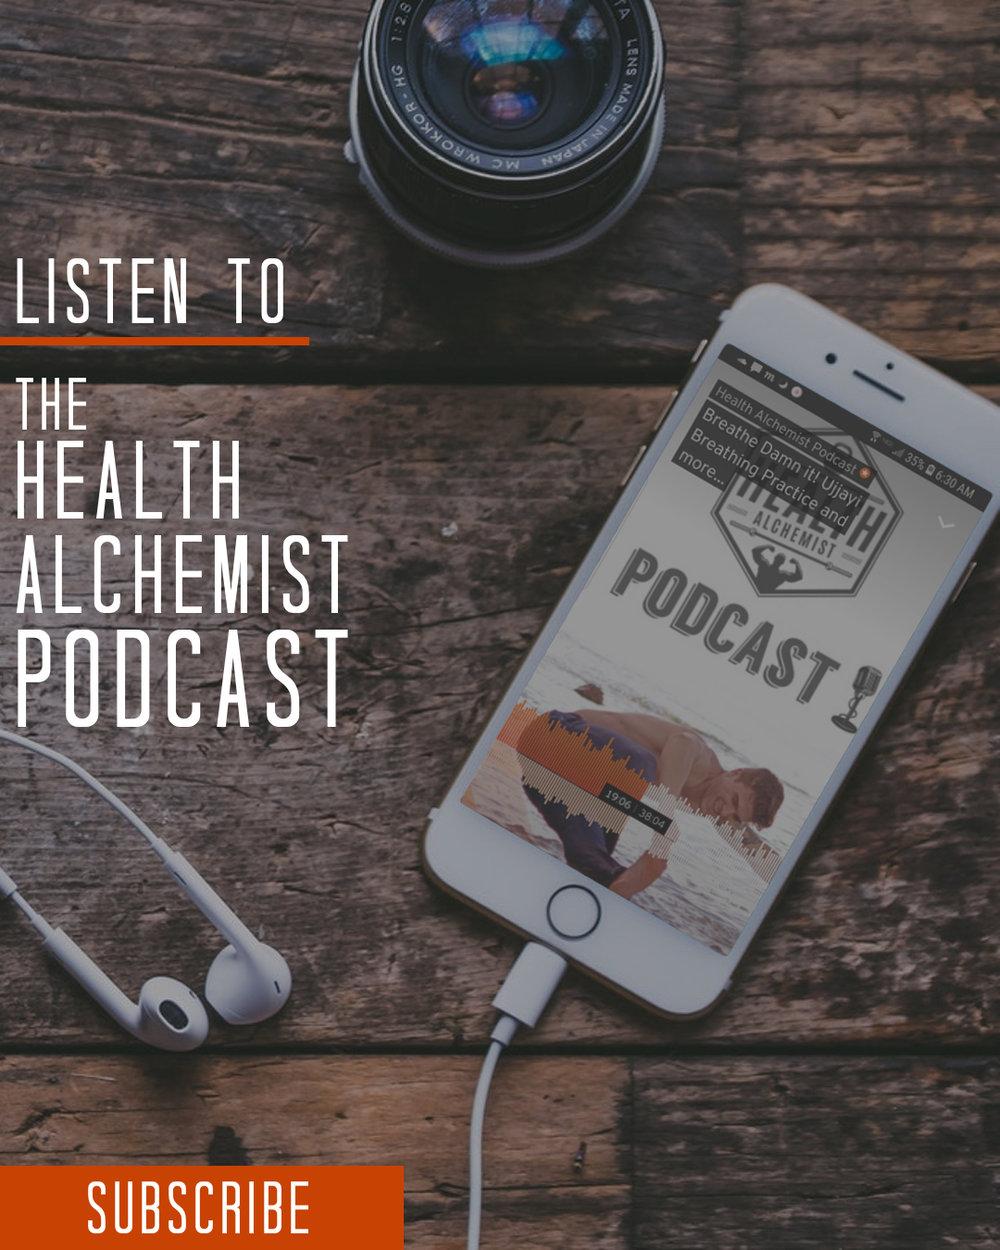 Health Alchemist Podcast - health alchemist training.com